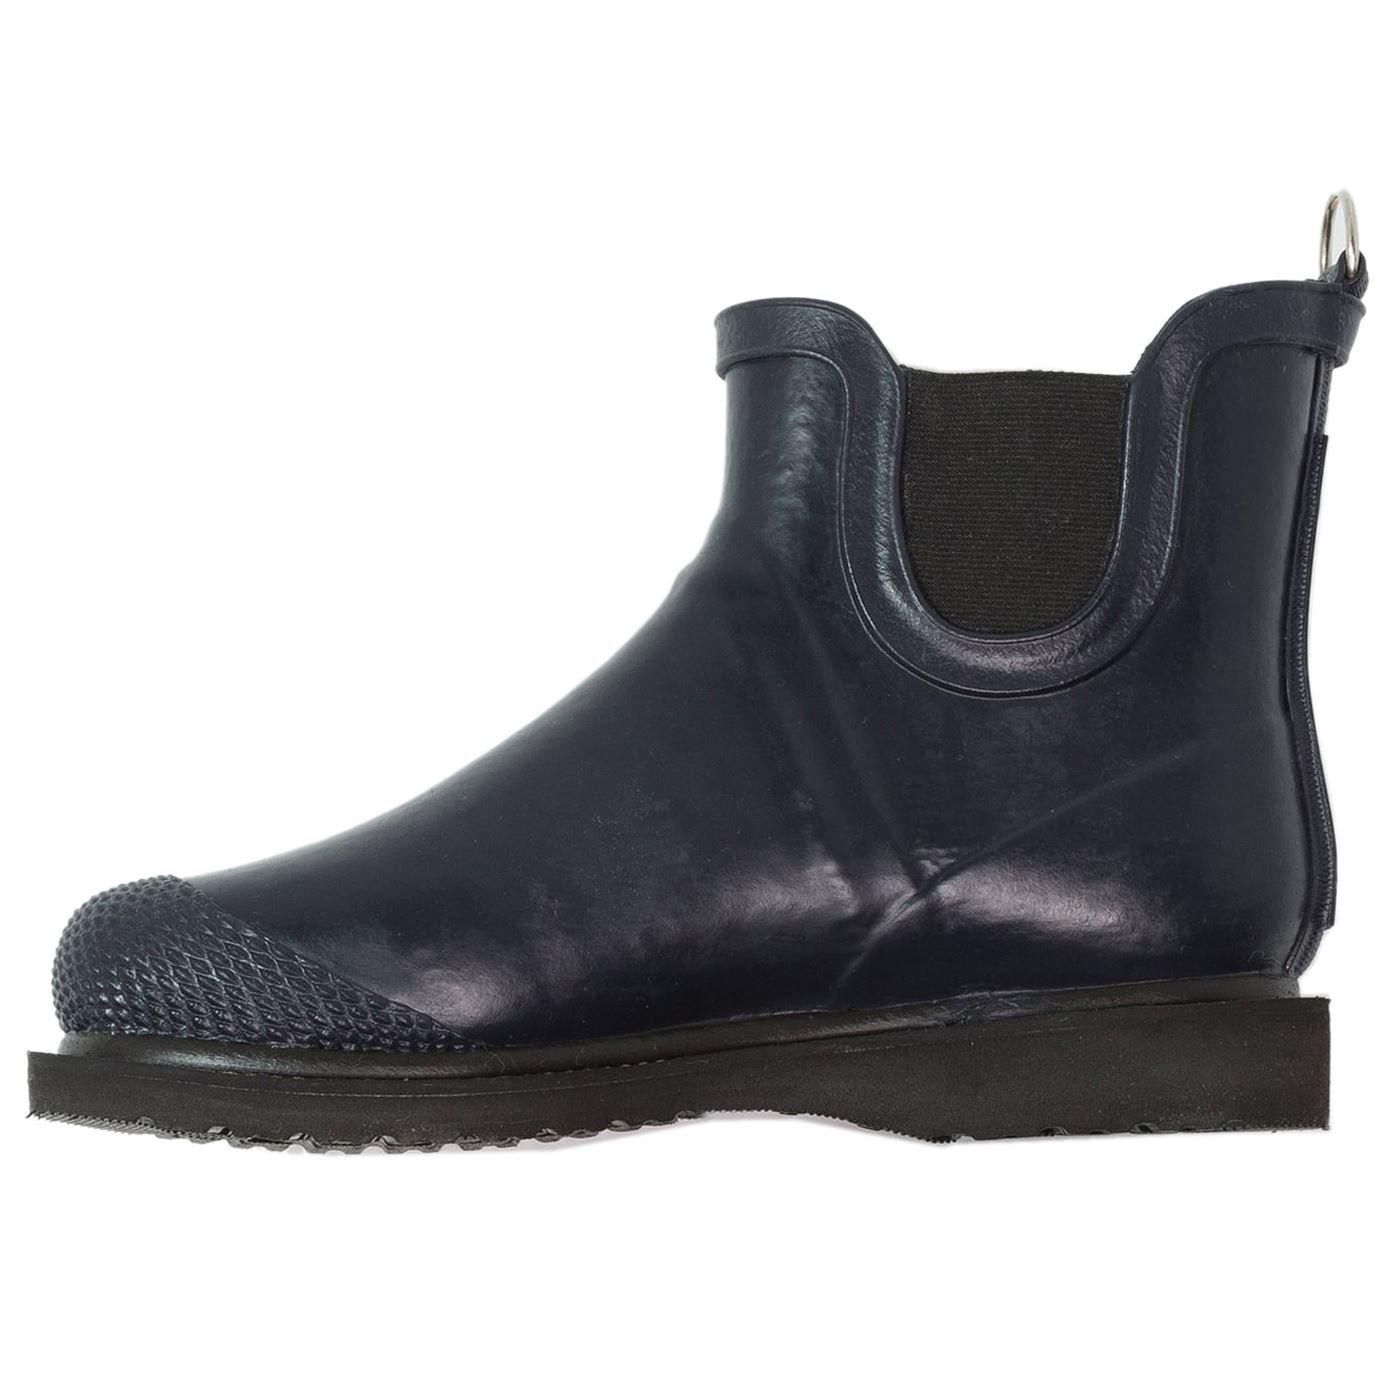 Ilse Jacobsen Women's Short Rubber Boot,Dark Indigo,EU 40 M by ILSE JACOBSEN (Image #4)